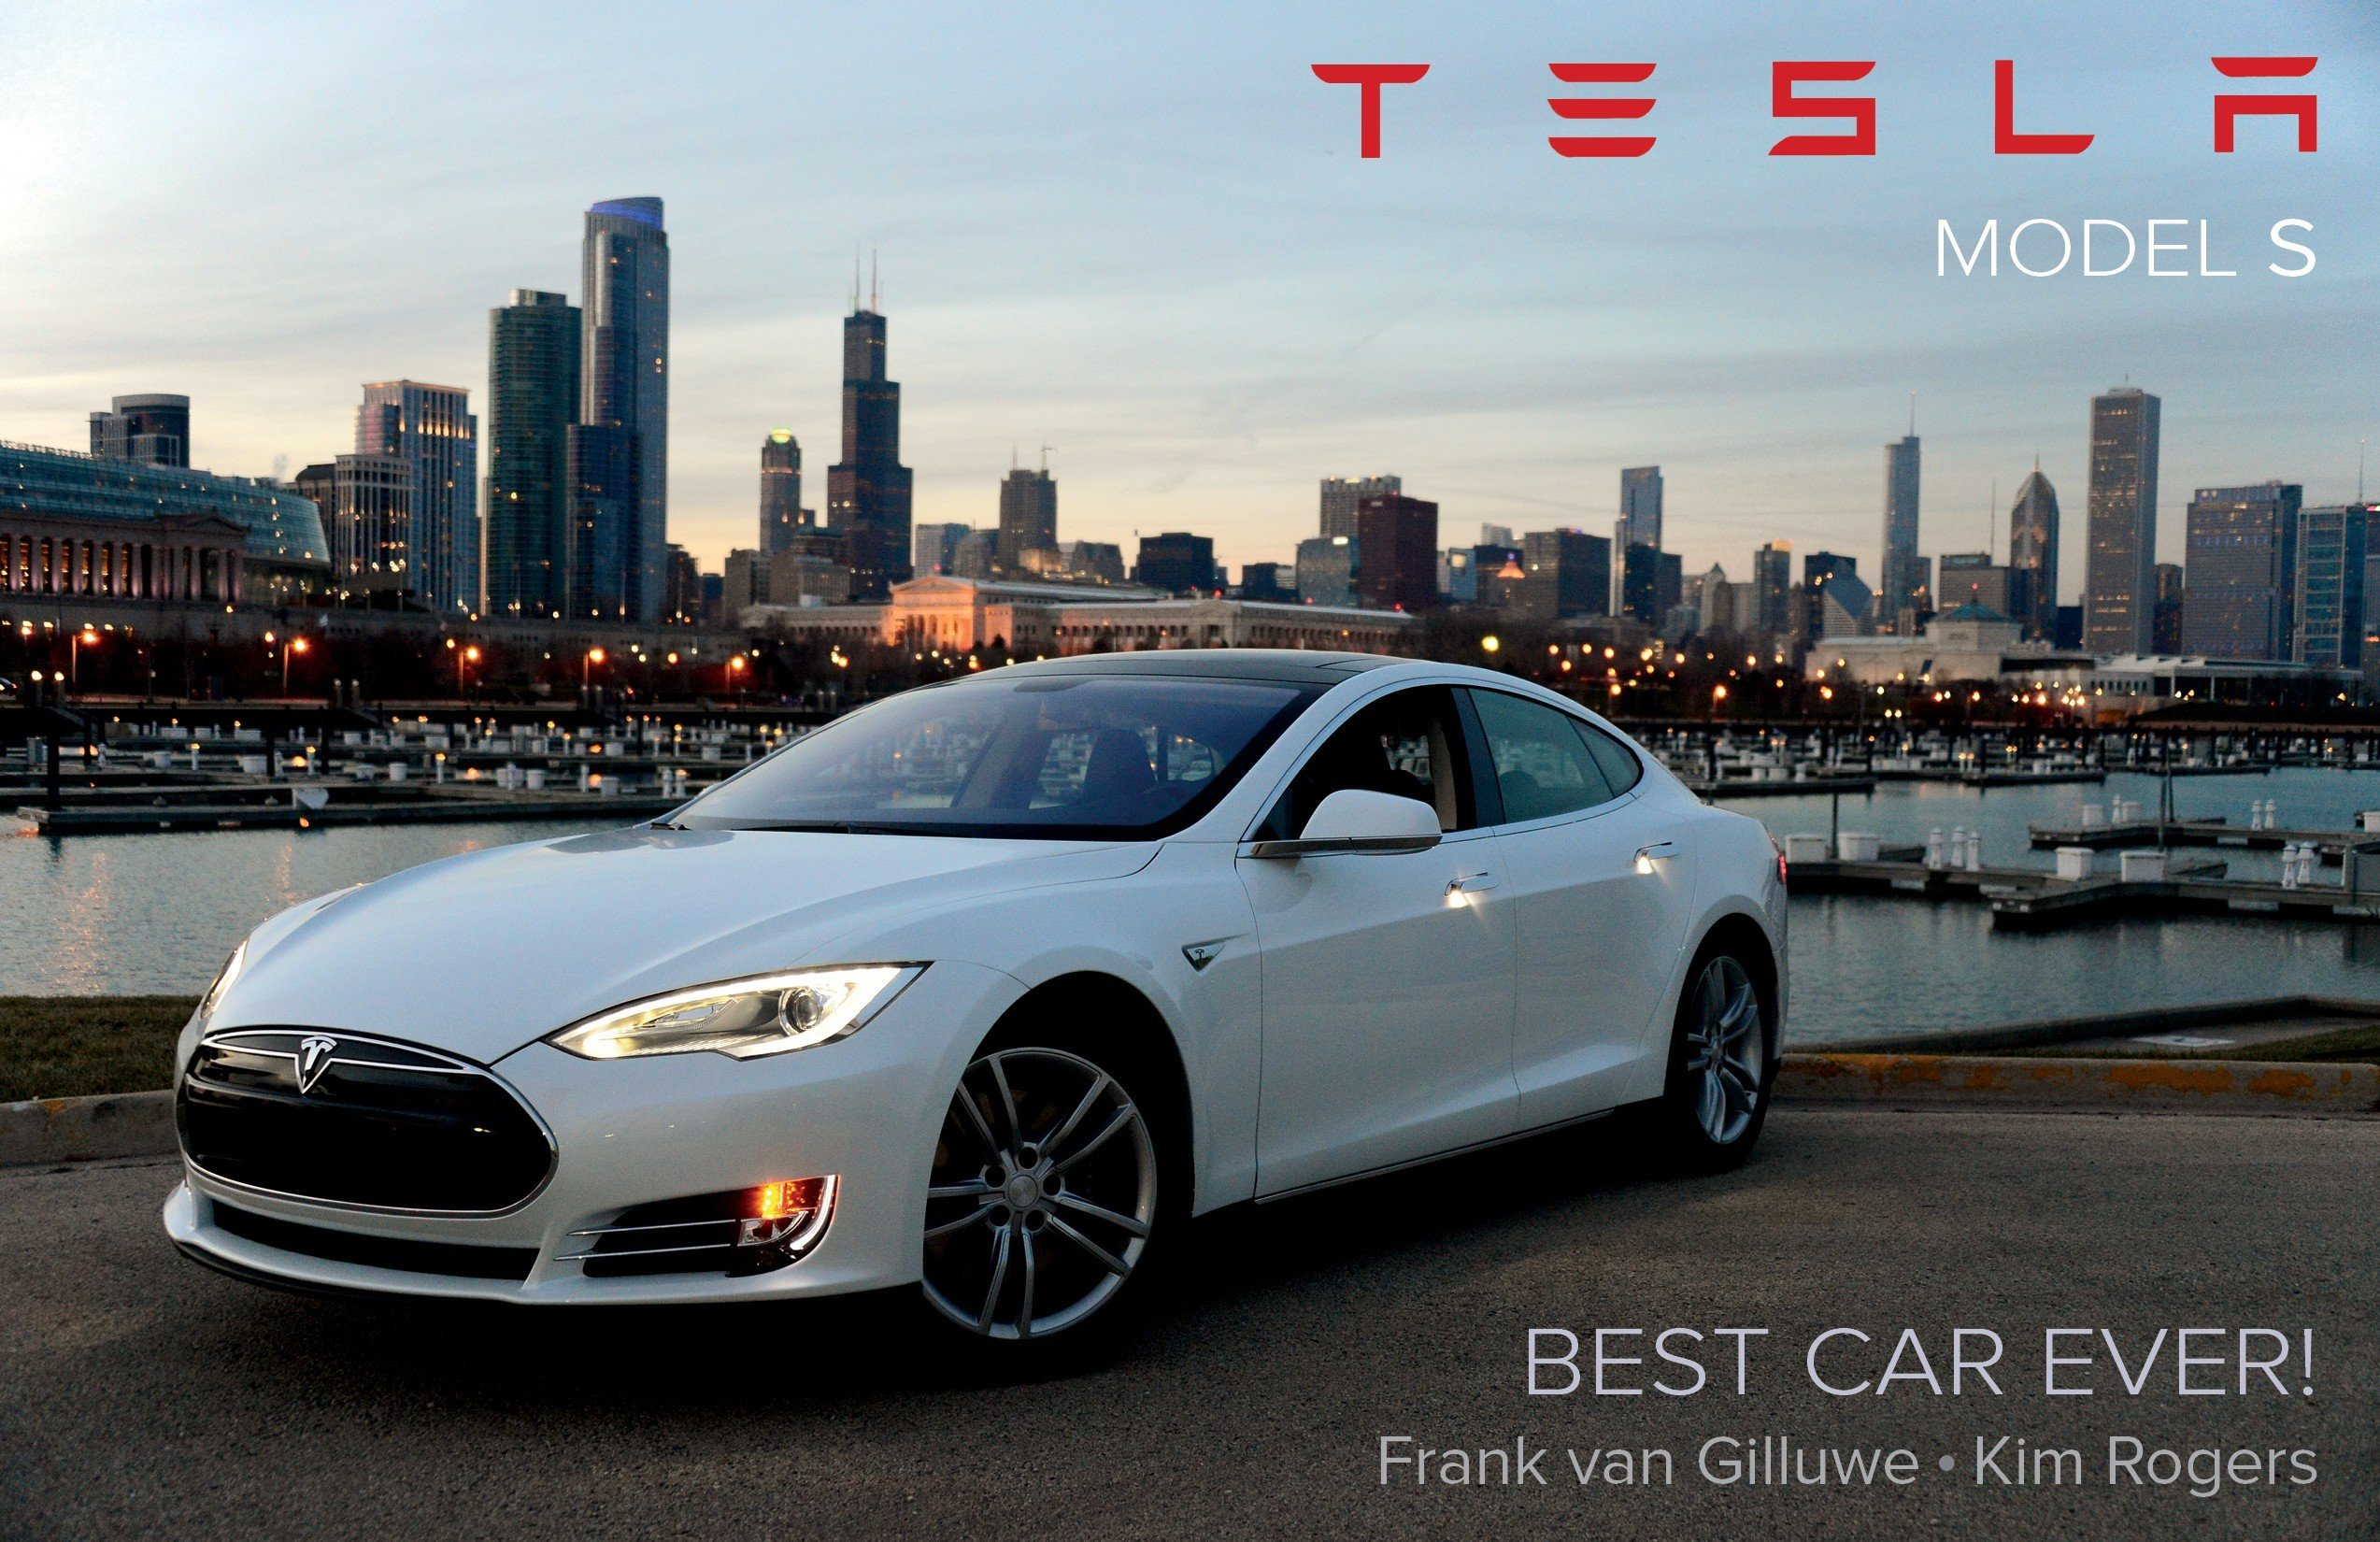 Worksheet. Tesla Model S  Best Car Ever Frank van Gilluwe Kim Rogers